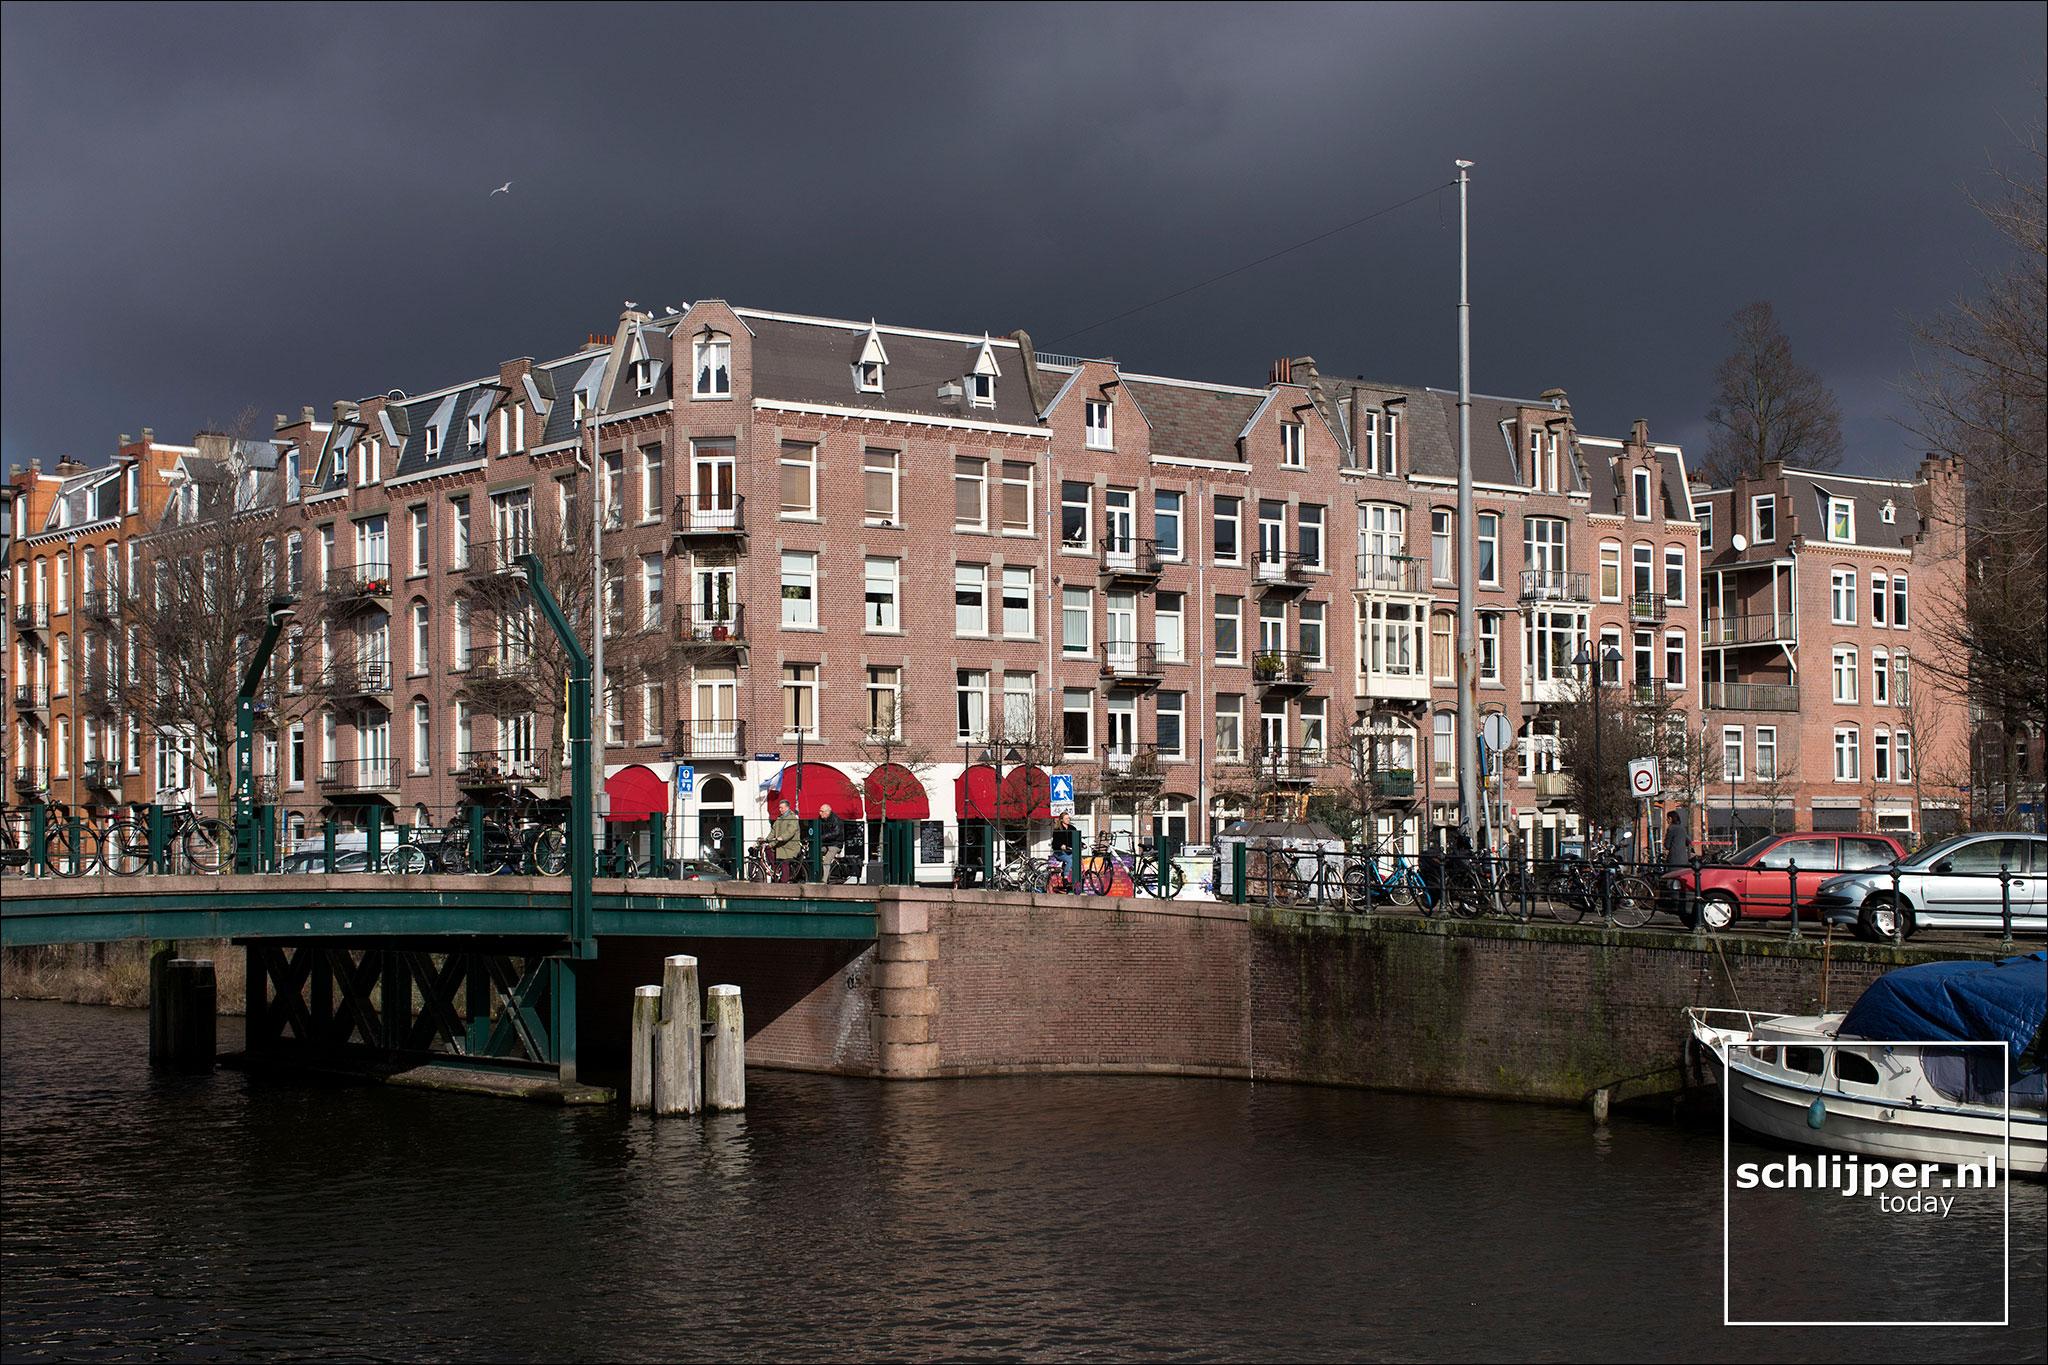 The Netherlands, Amsterdam, 11 februari 2019